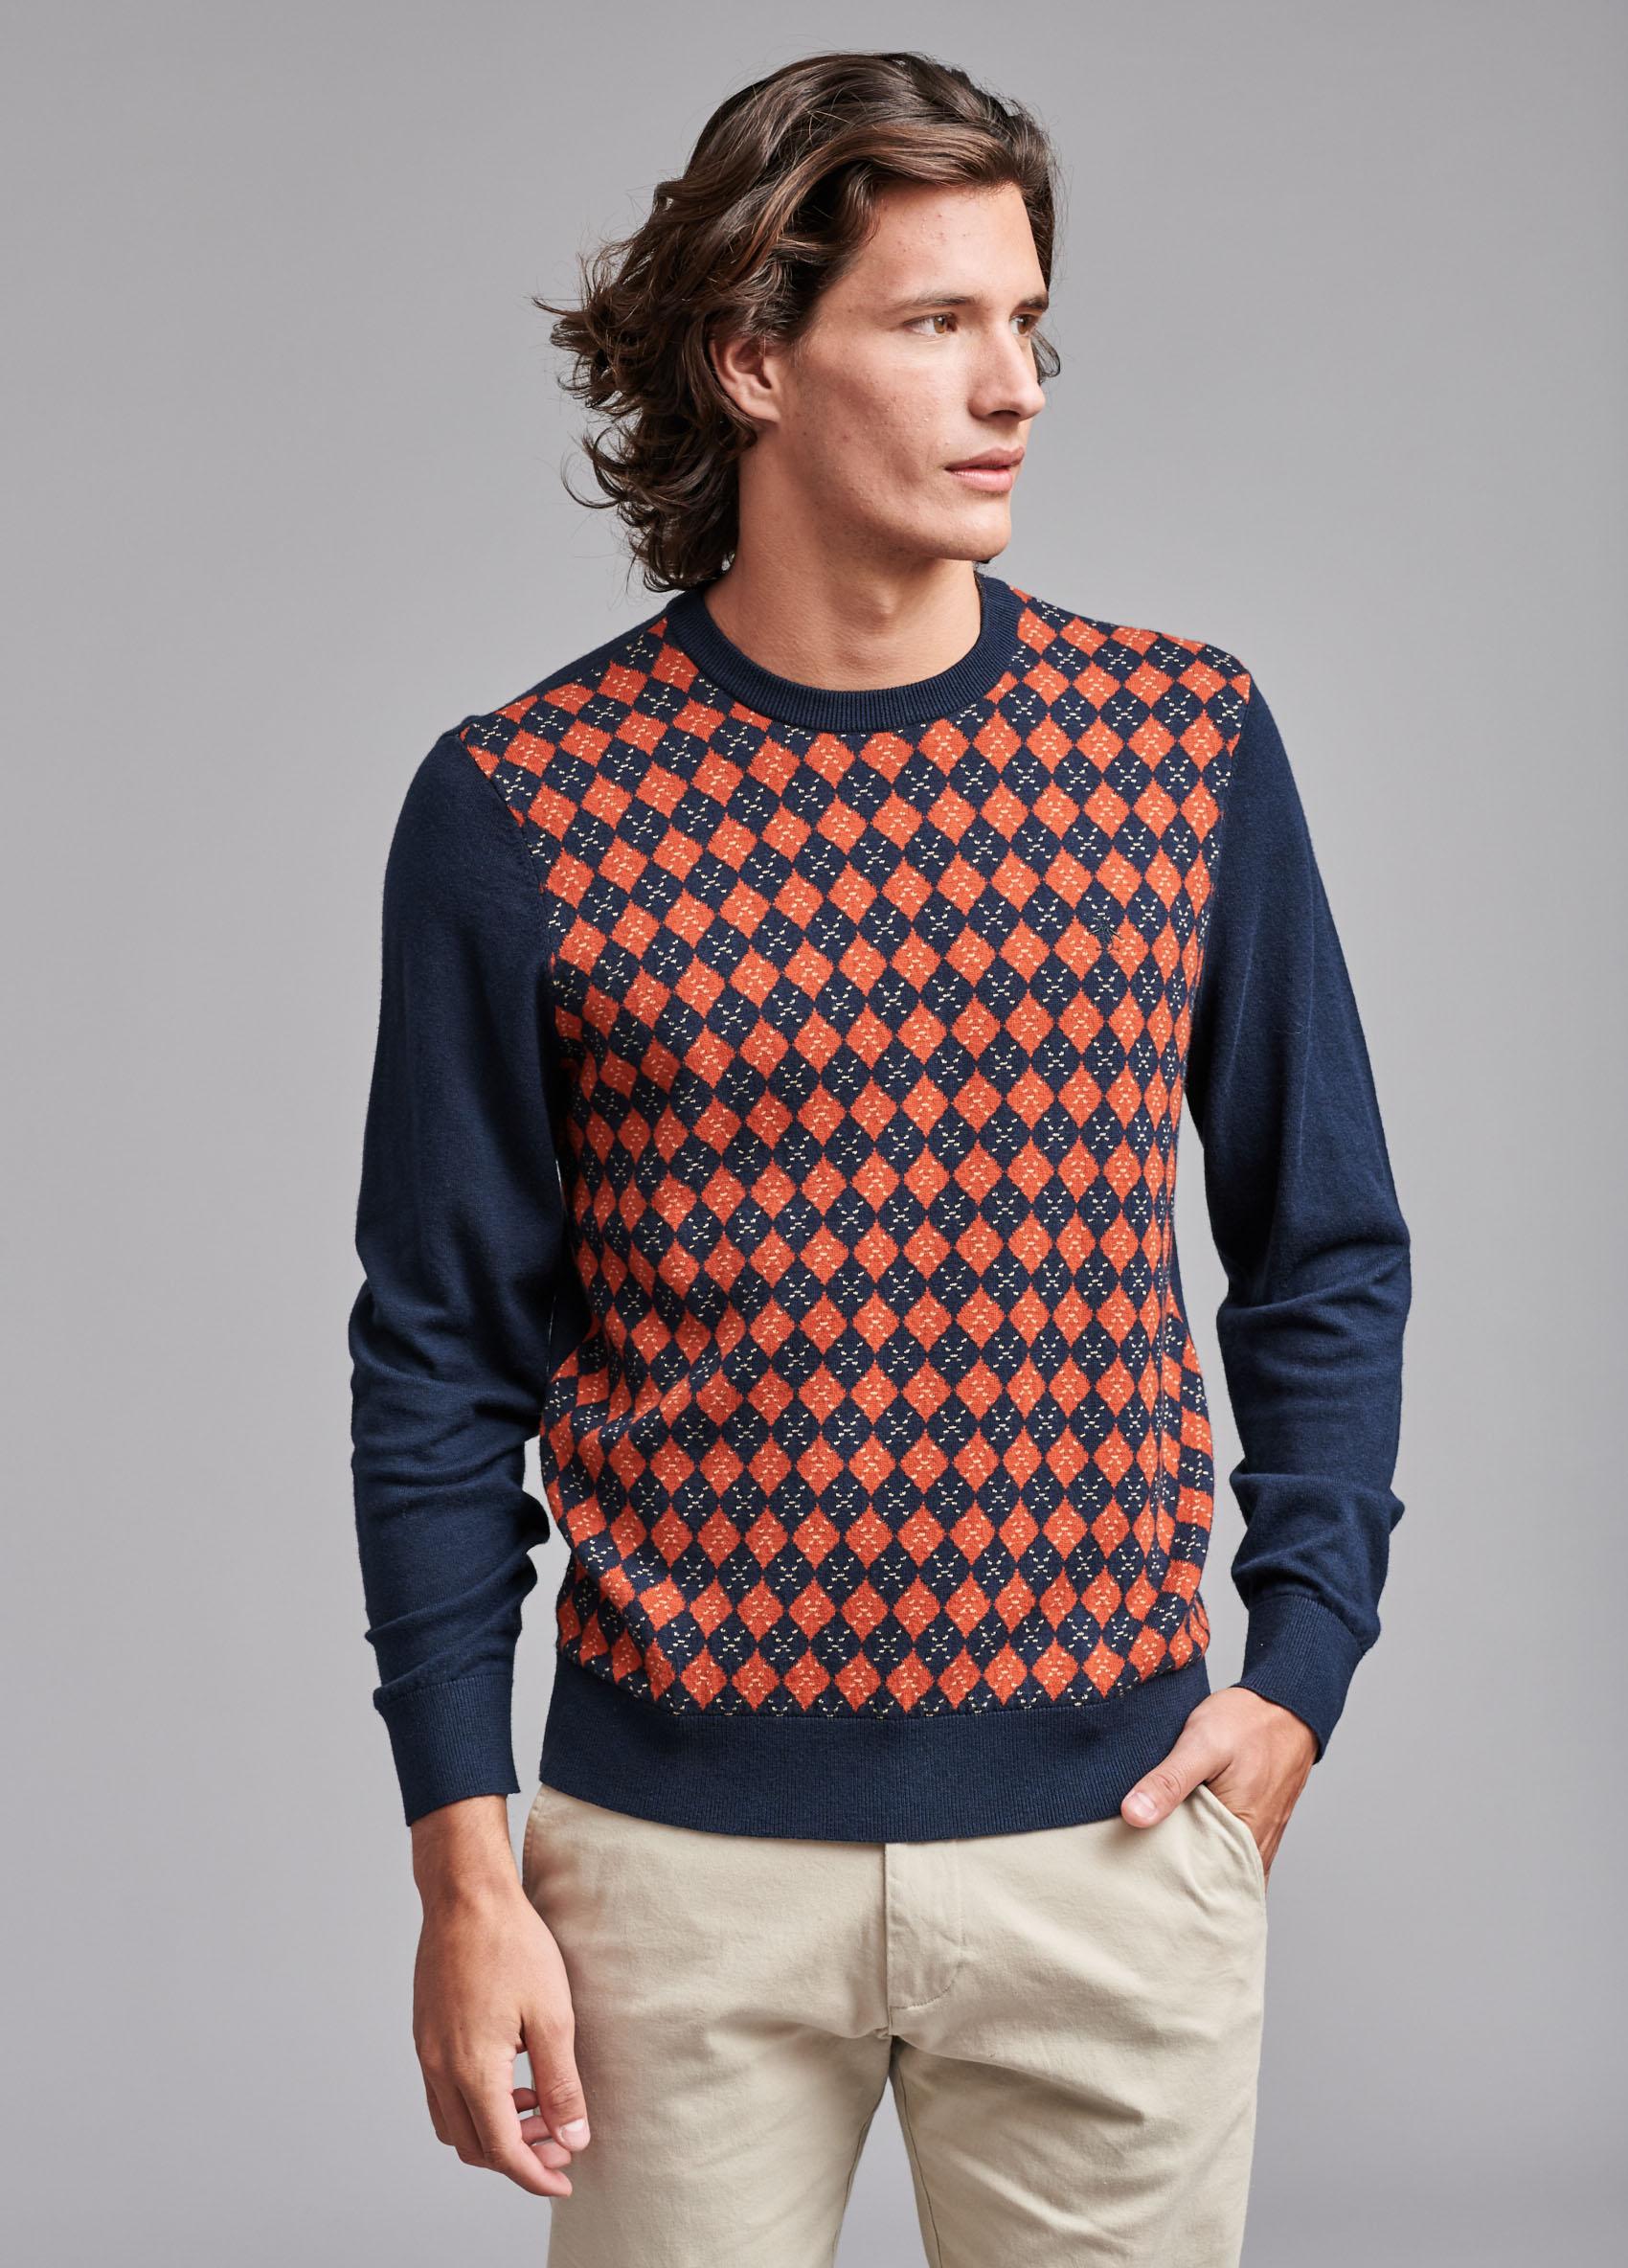 penguin_argyle-jacquard-front-sweater_15-06-2019__picture-9190